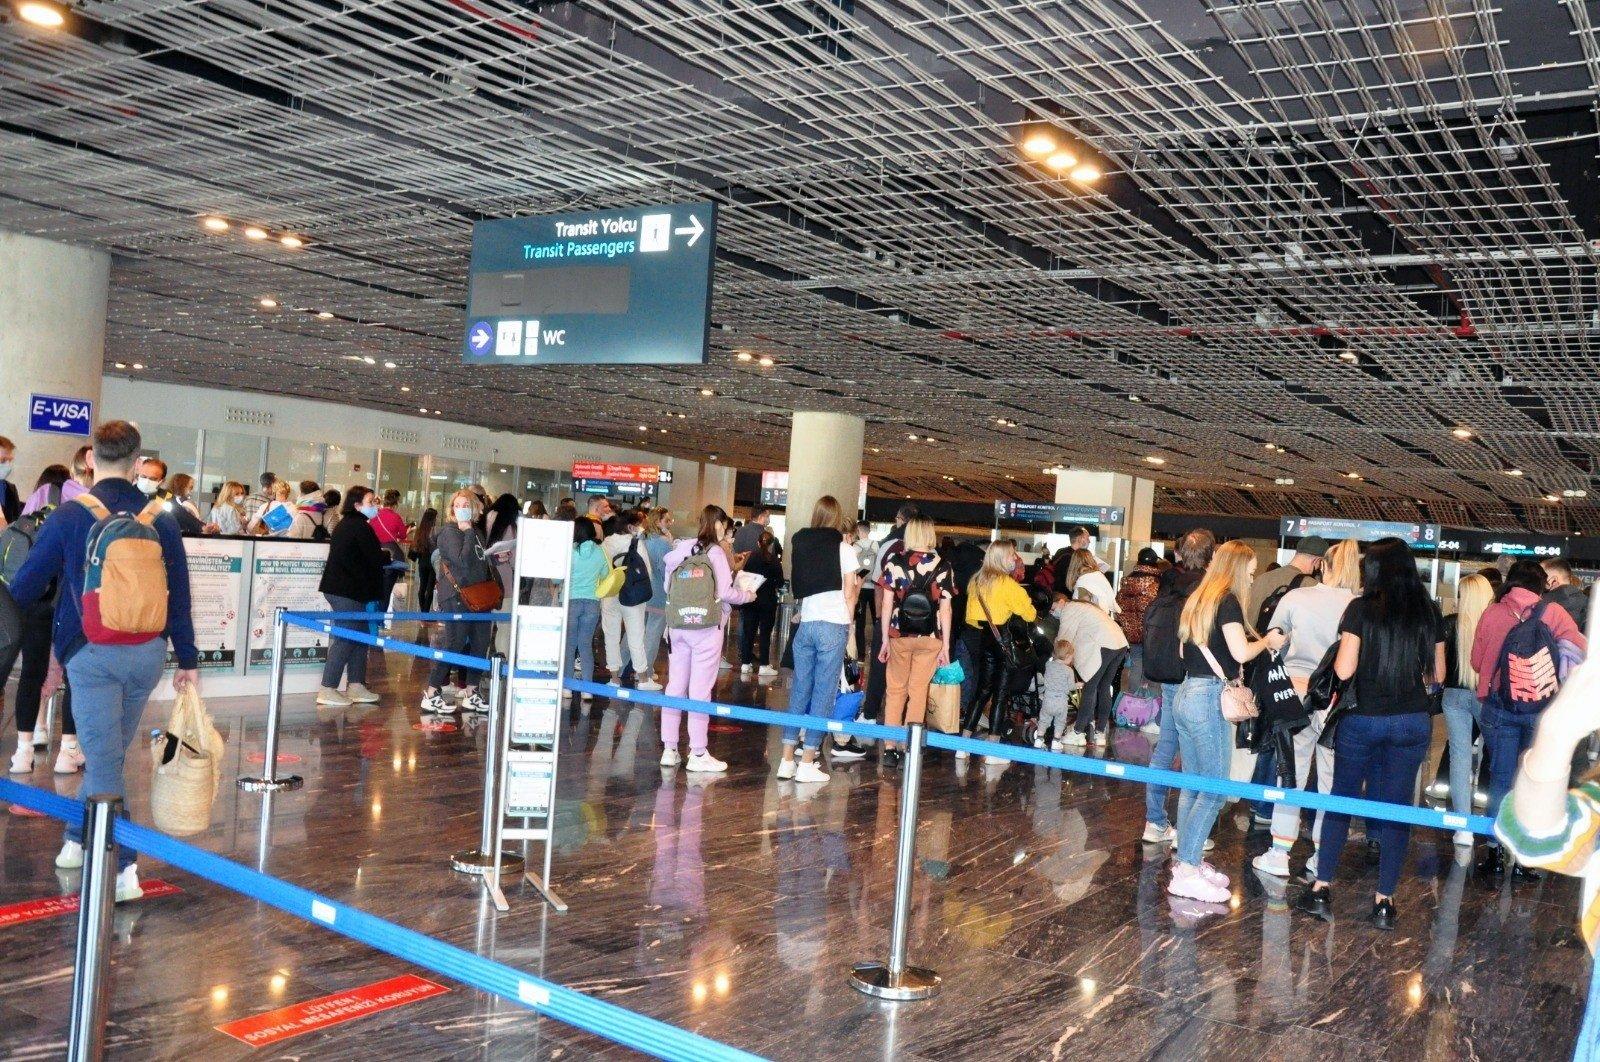 Russian tourists arrive at Milas-Bodrum Airport, Bodrum, southwestern Turkey, April 11, 2021. (IHA Photo)